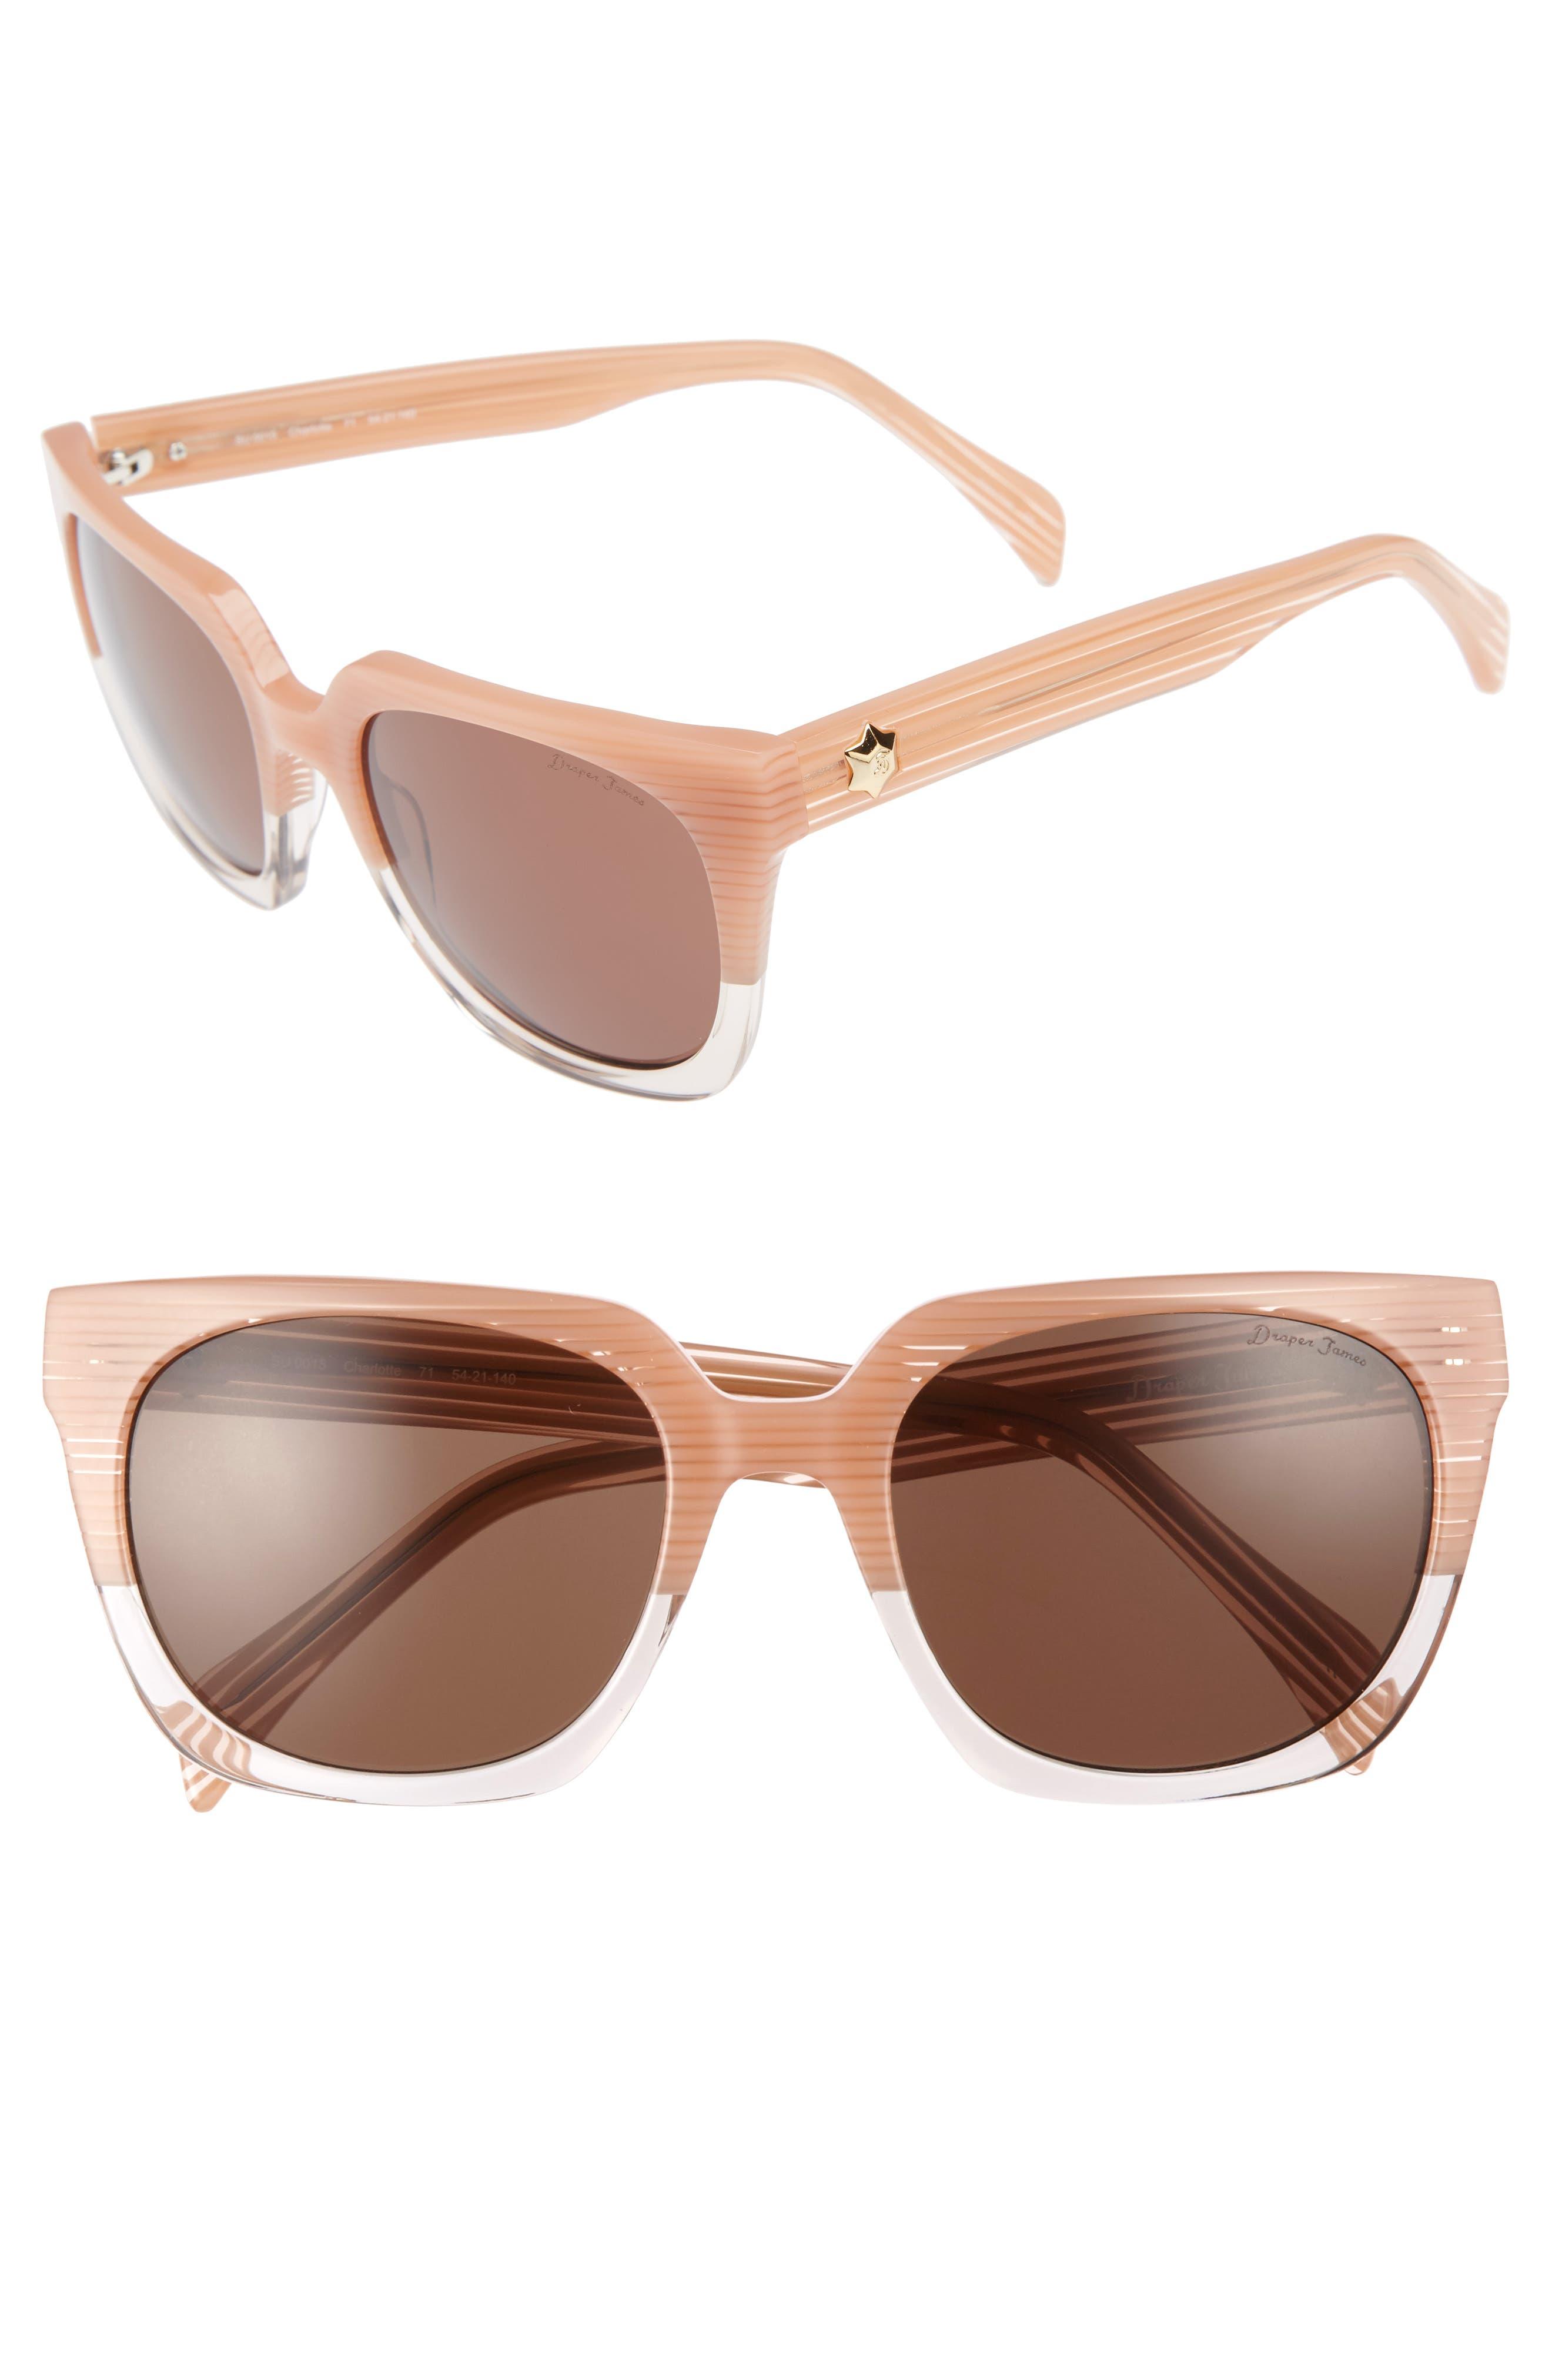 54mm Square Sunglasses,                             Main thumbnail 1, color,                             Pink